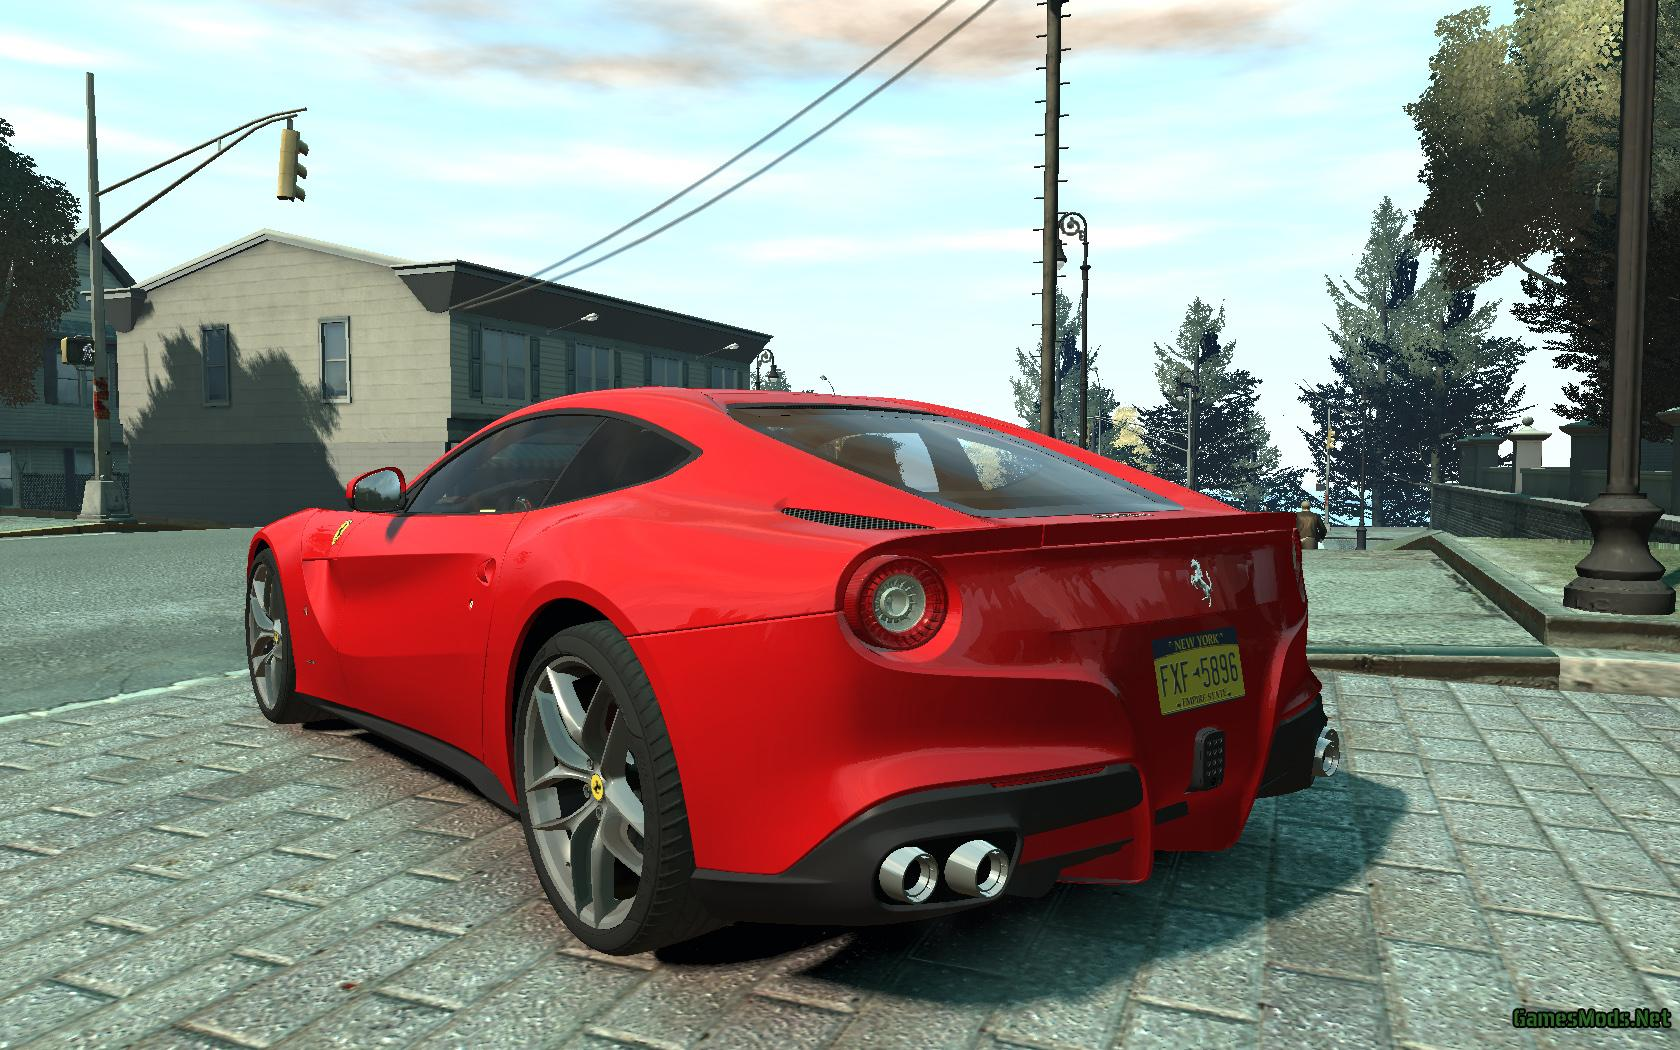 Parts For Cars >> 2013 Ferrari F12berlinetta [EPM] » GamesMods.net - FS17, CNC, FS15, ETS 2 mods